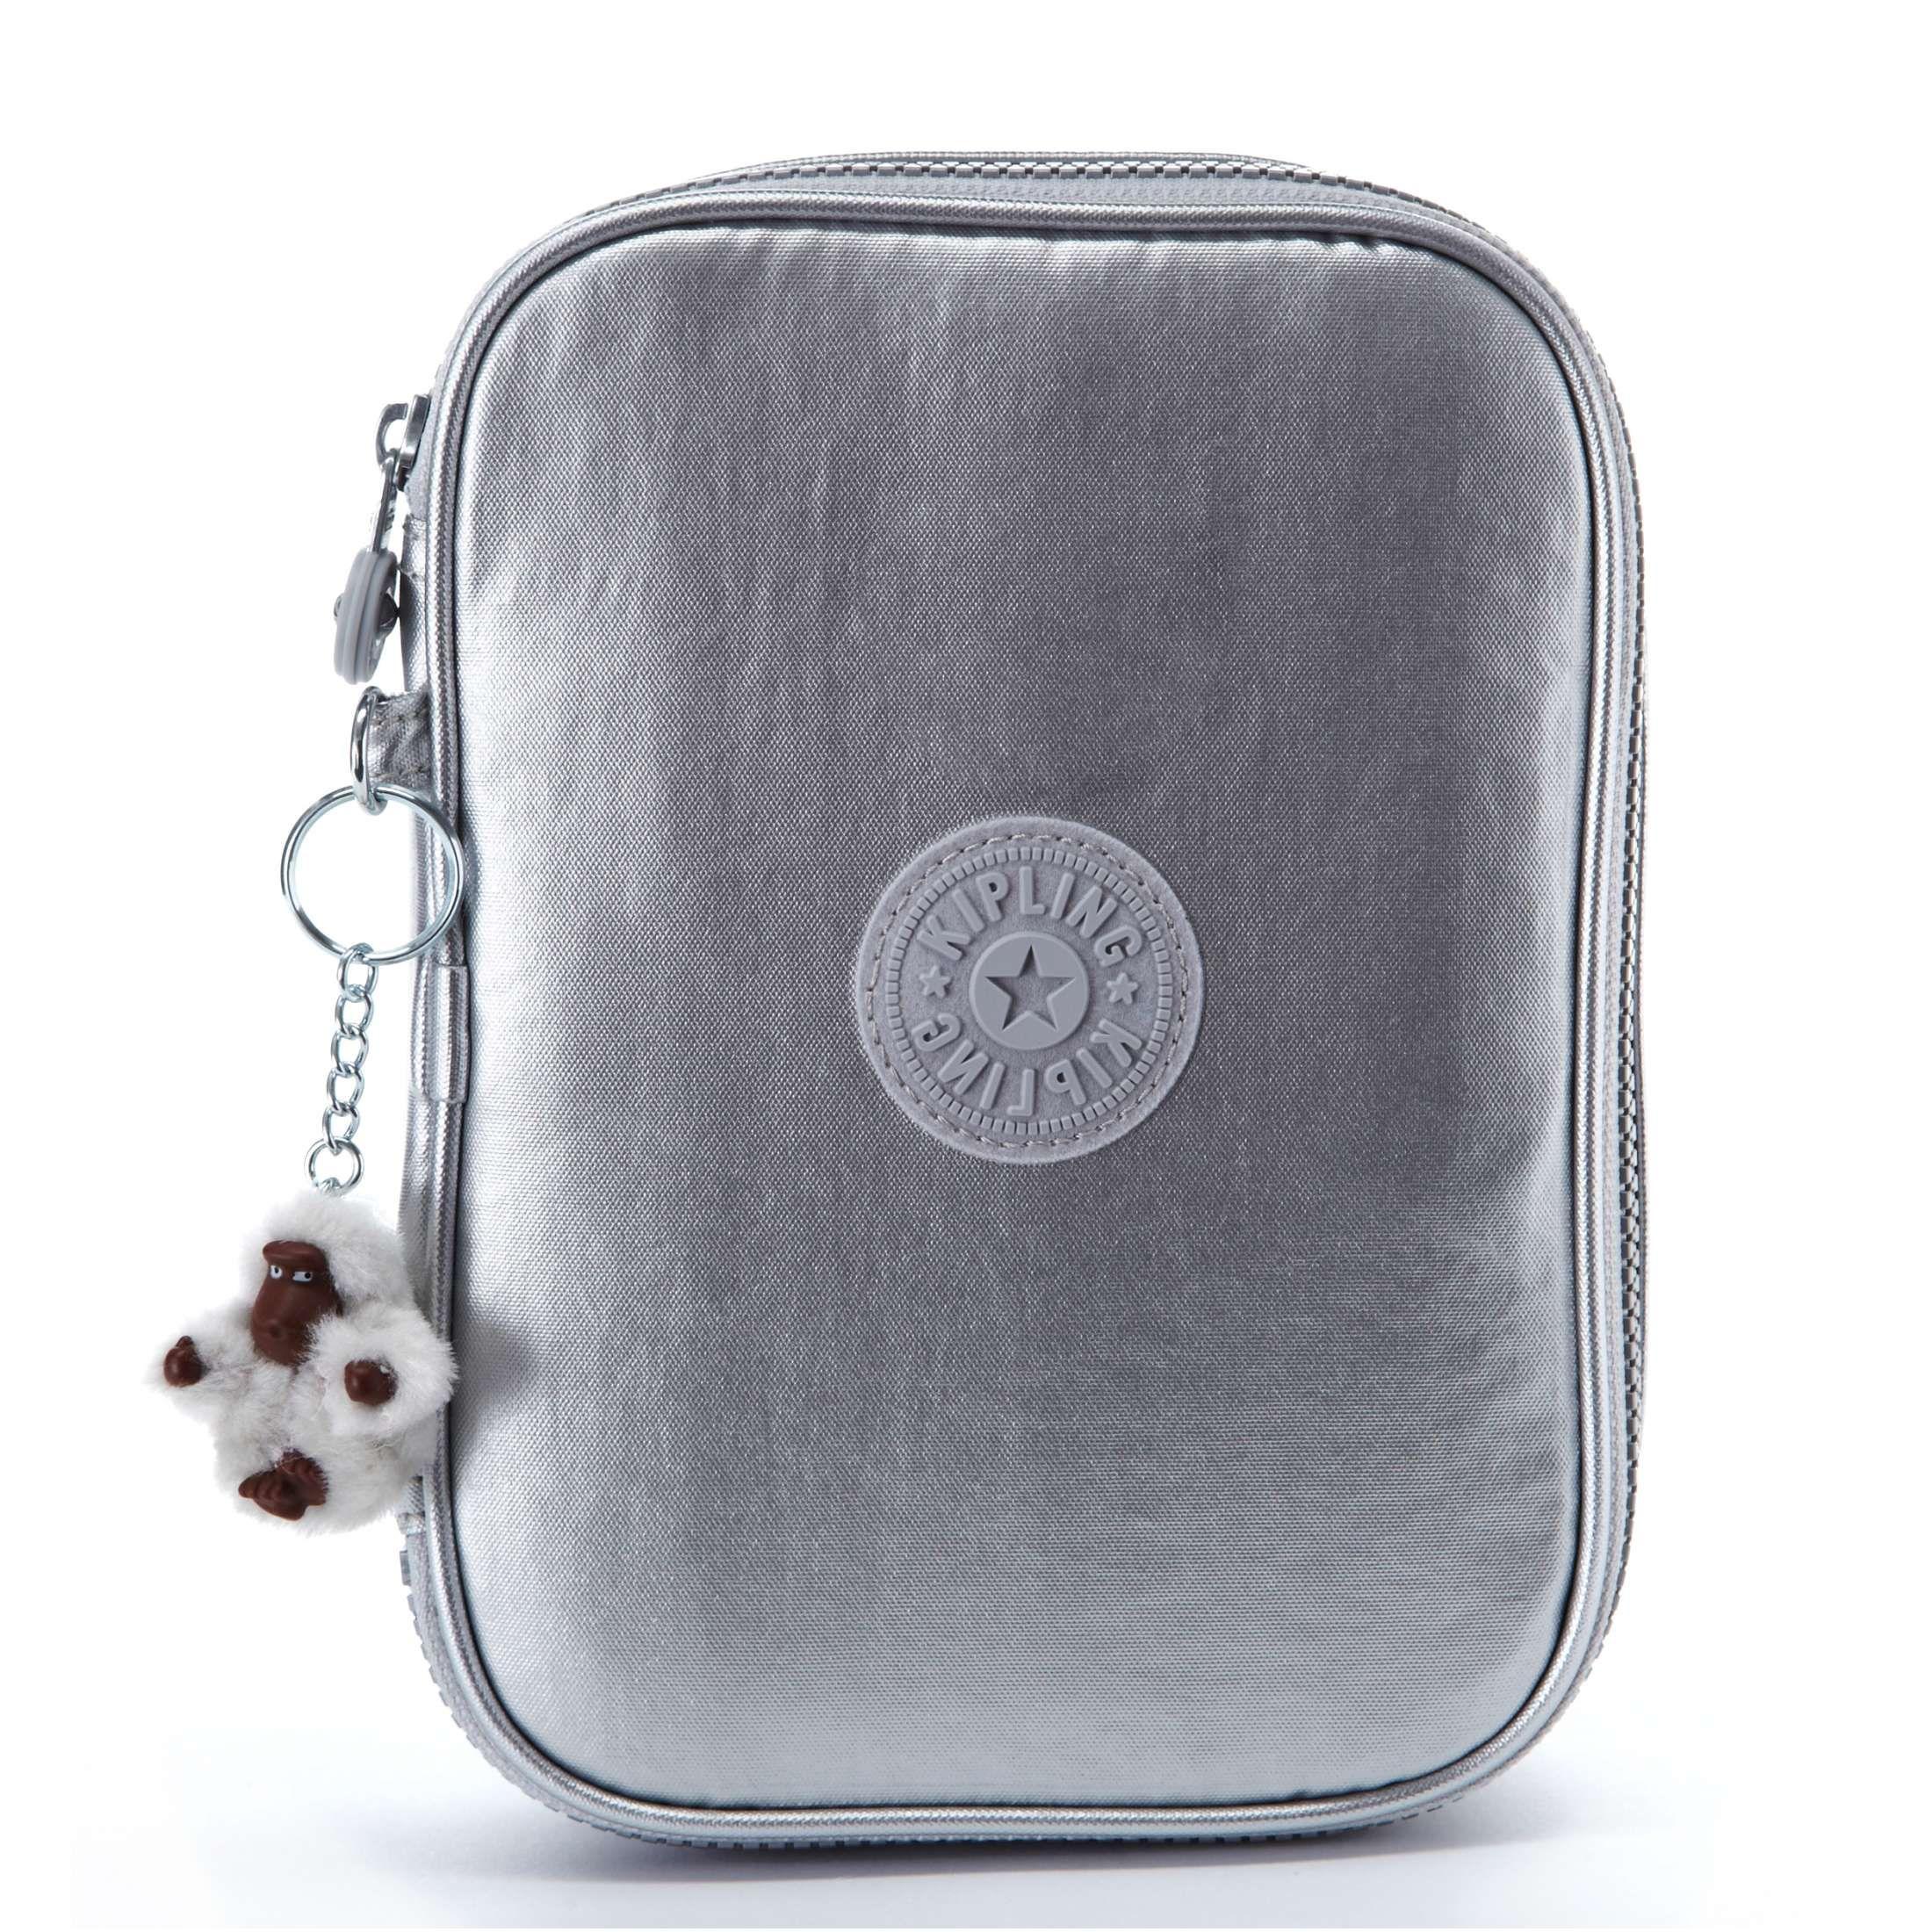 04699862e 100 Pens Metallic Case | love | Kipling 100 pens case, Pen case ...